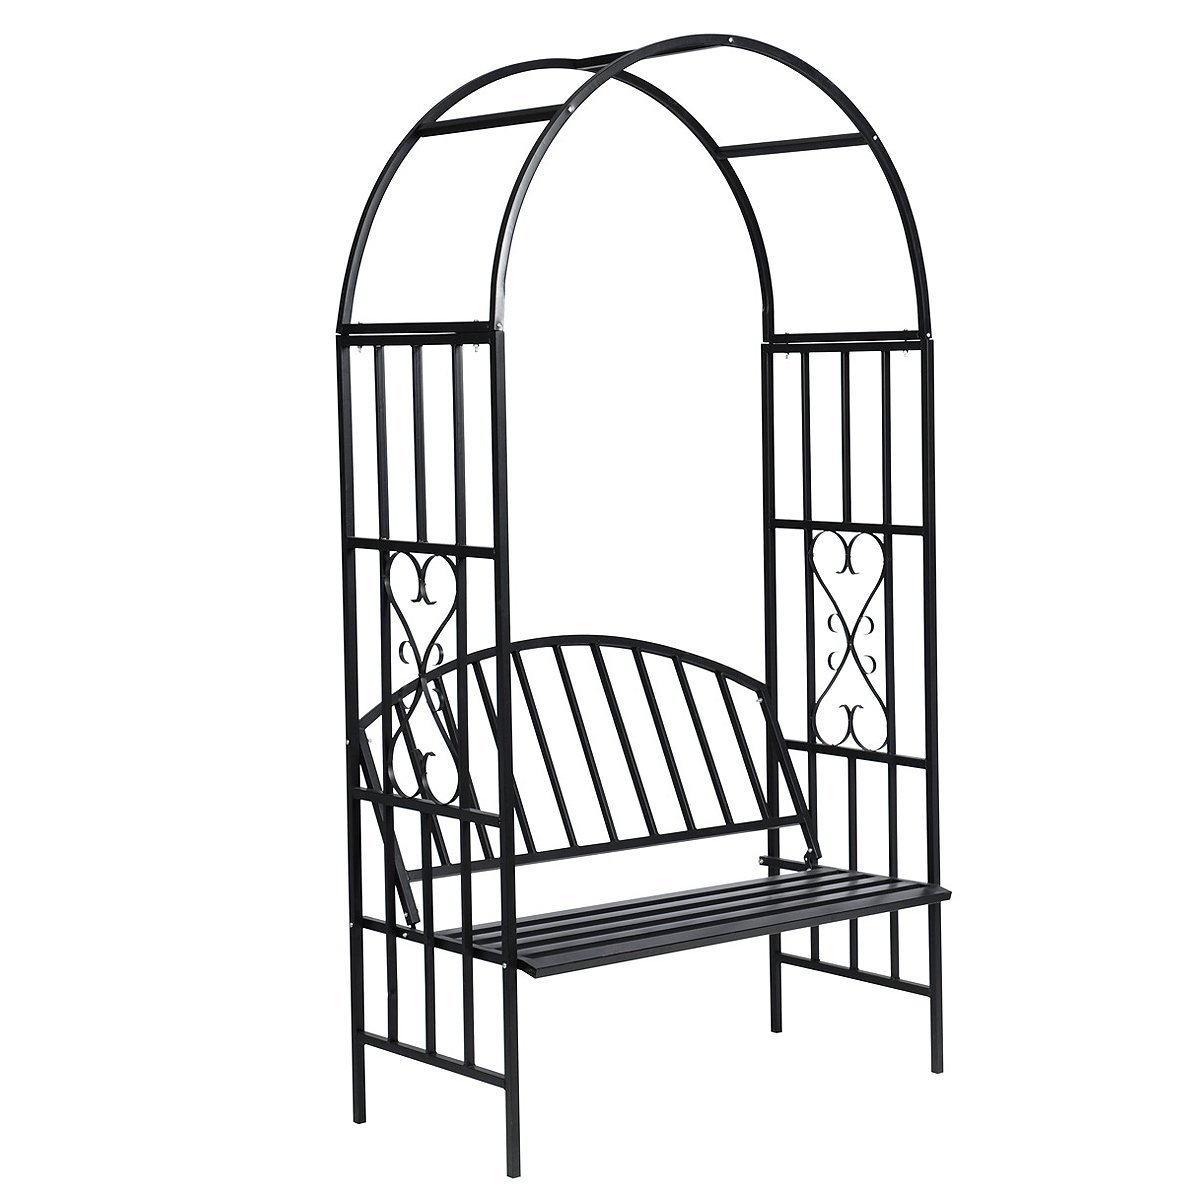 vidaXL Arch Bench Rose Garden Steel Trellis Arbor Decorative 14546